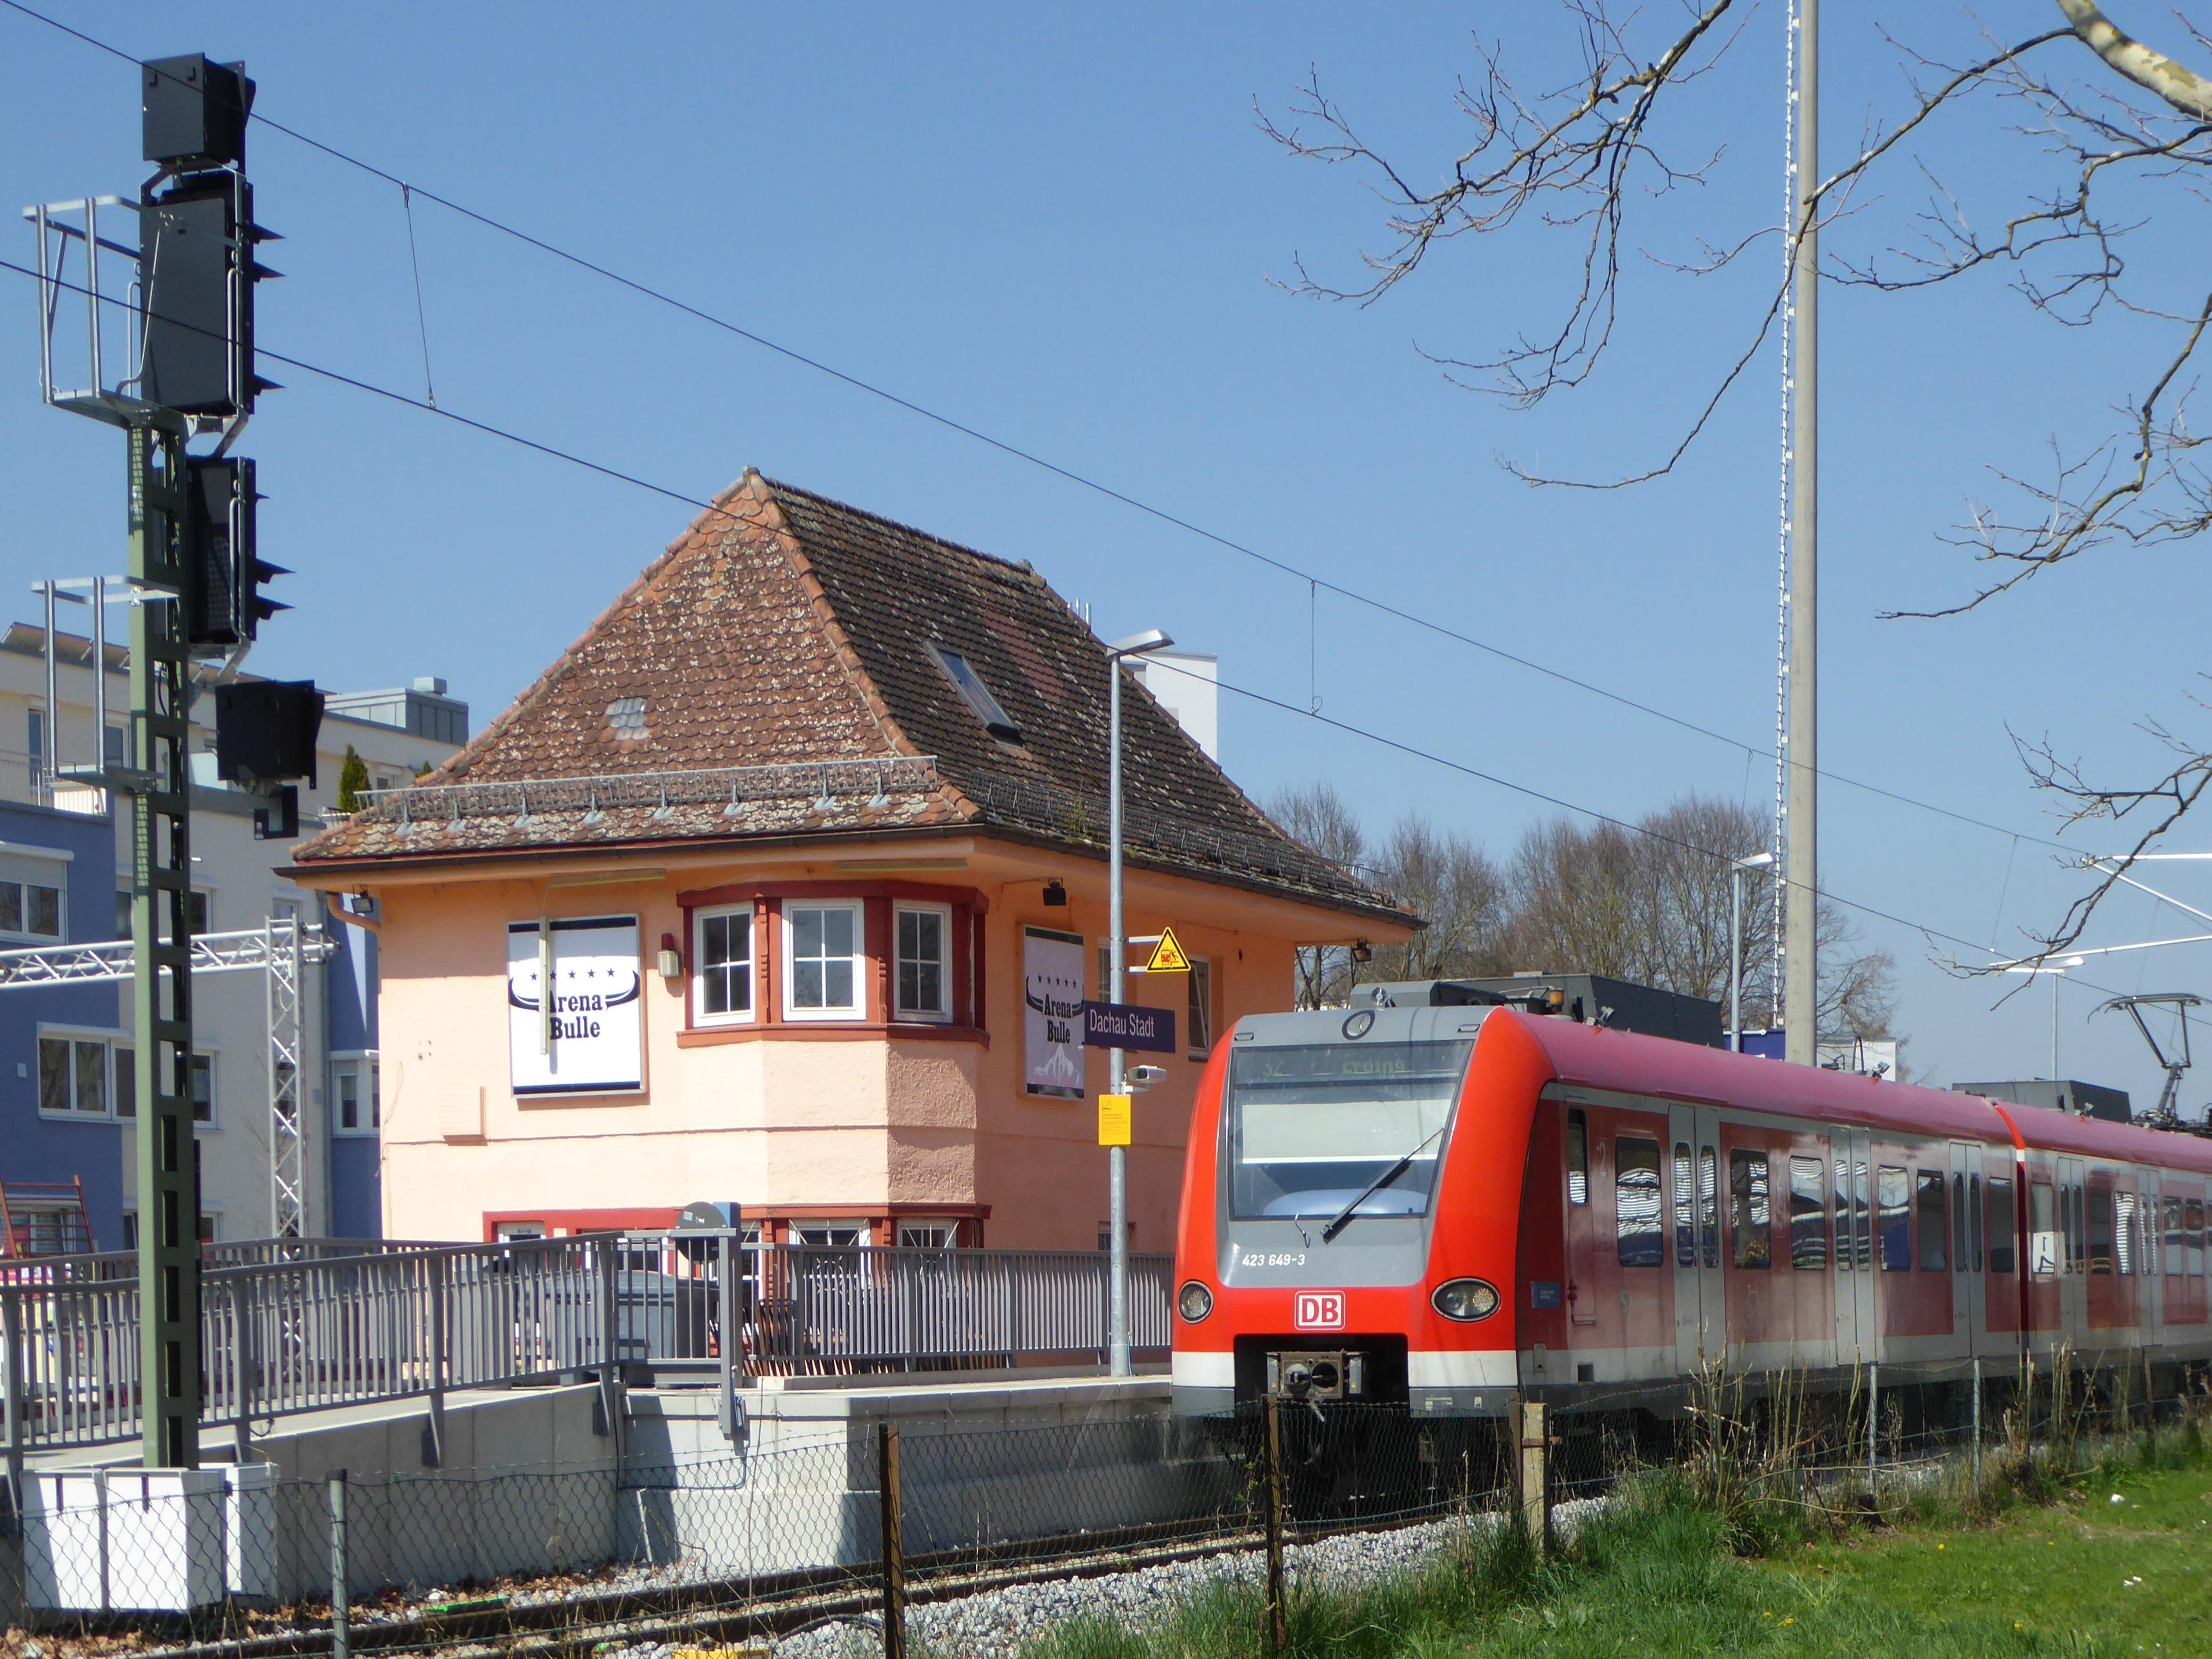 File:ET 423 am Bahnhof Dachau Stadt, 1.jpeg